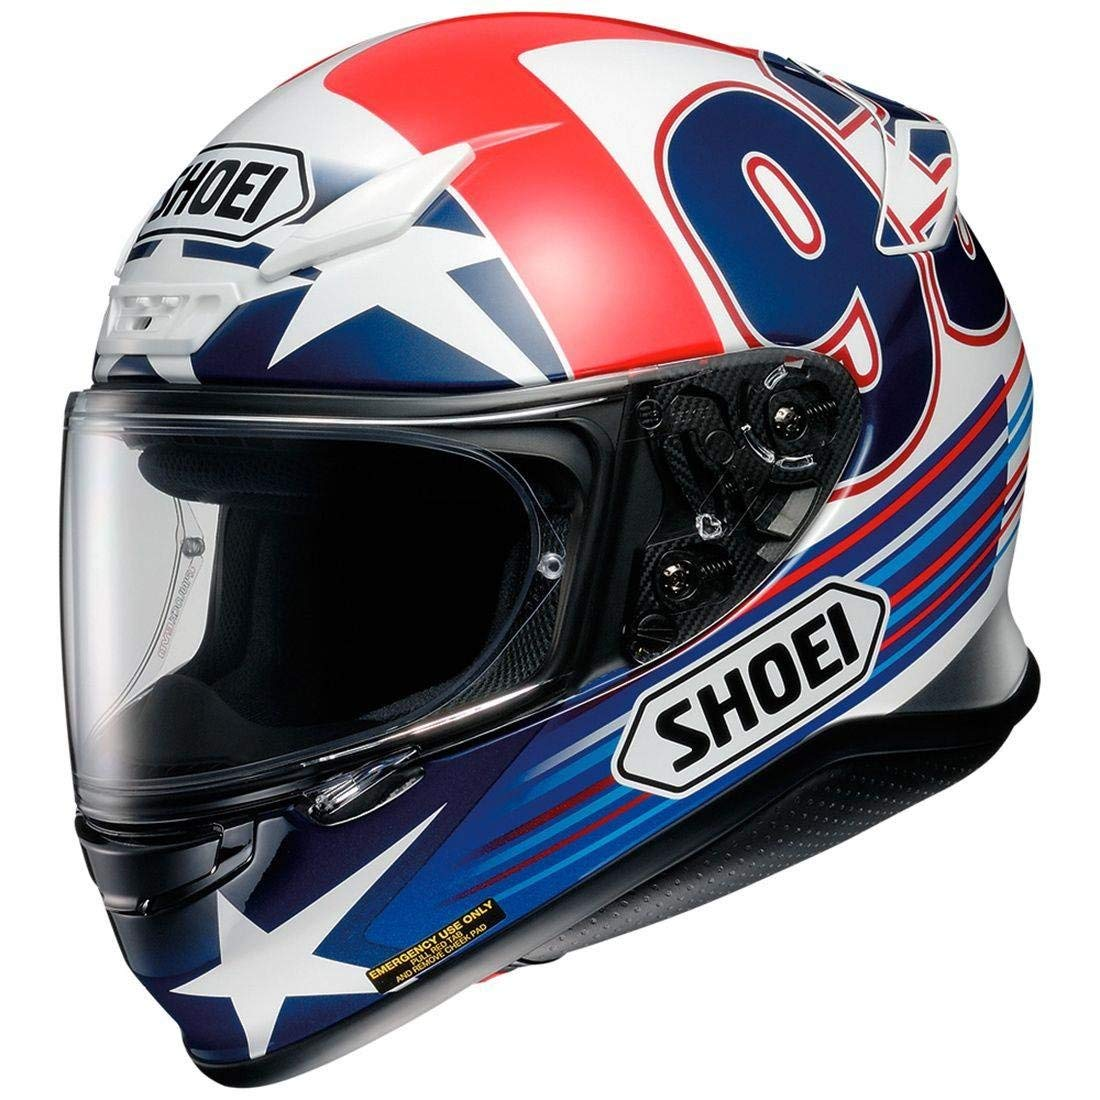 Shoei RF-1200 full face motorcycle helmet